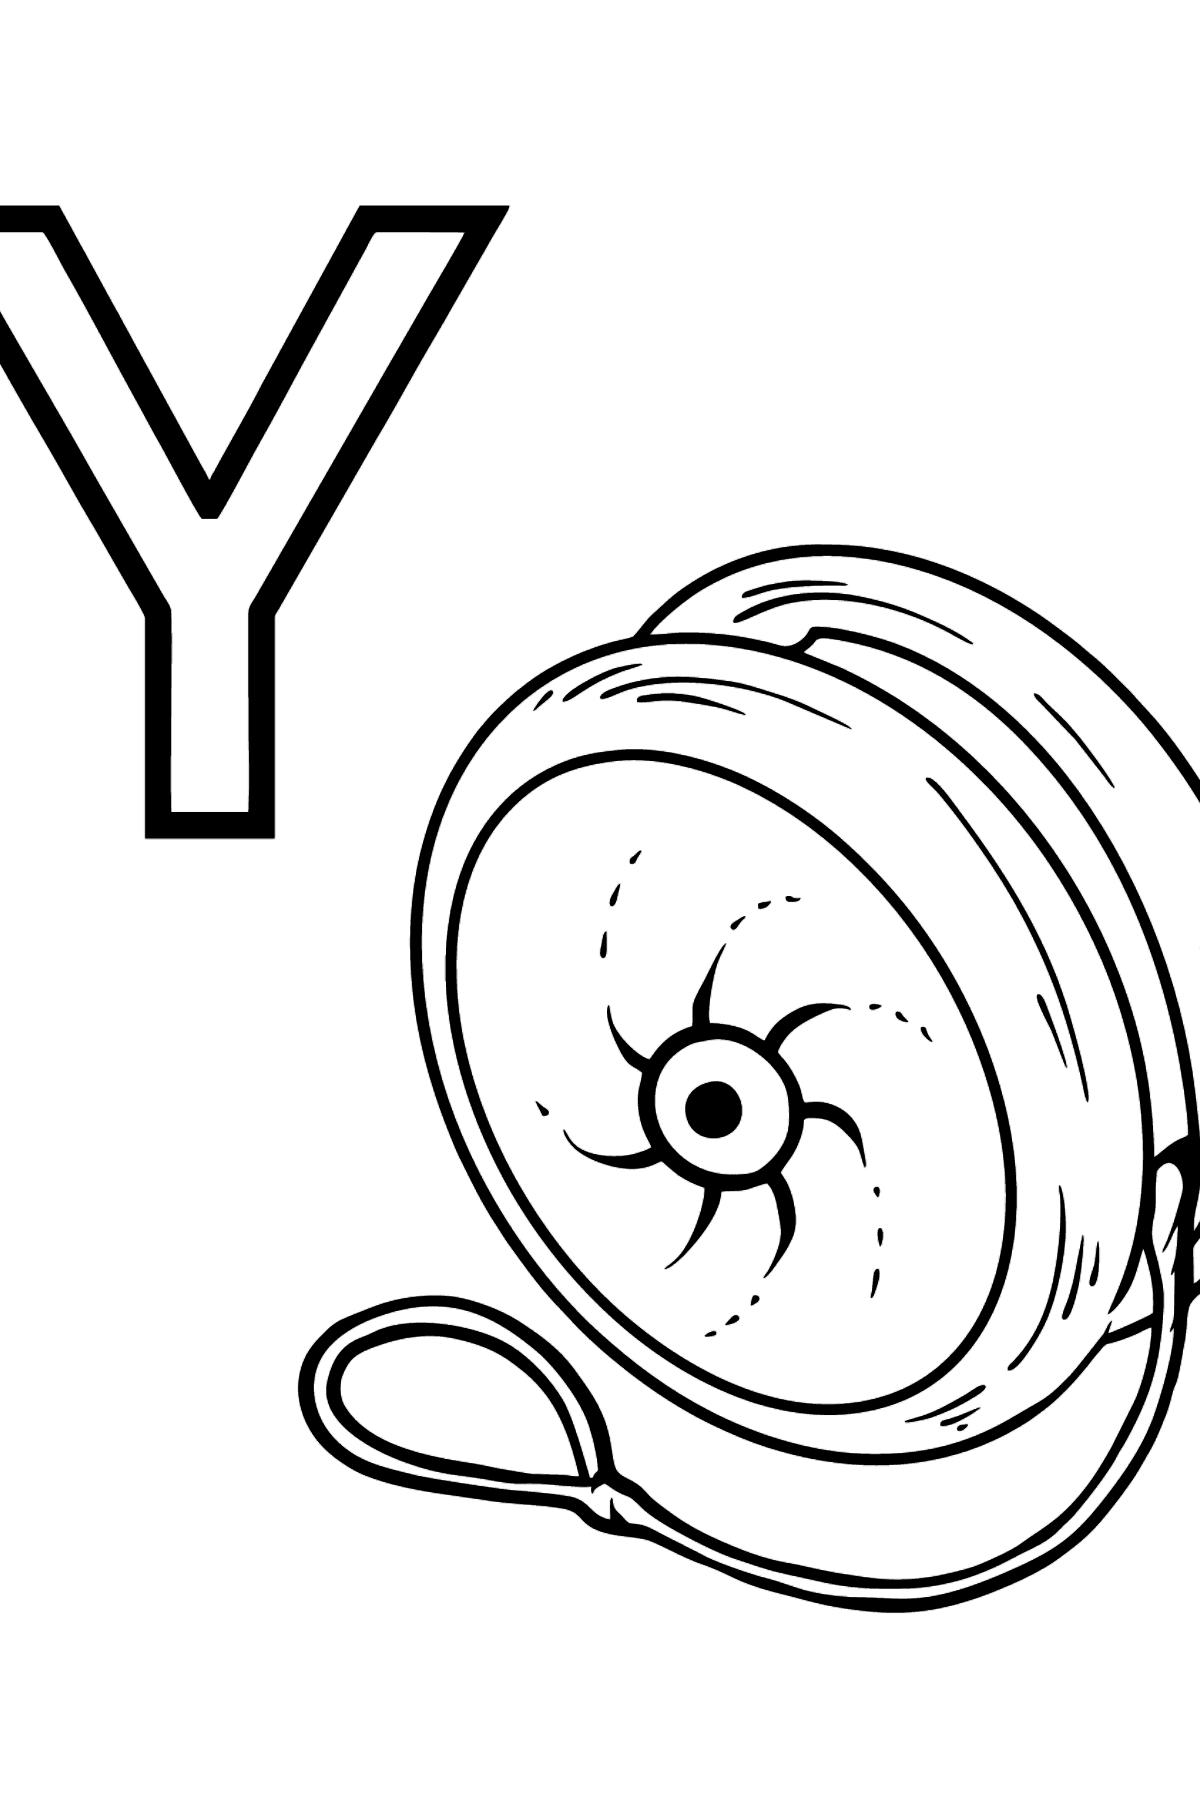 Portuguese Letter Y coloring pages - YO YO - Coloring Pages for Kids